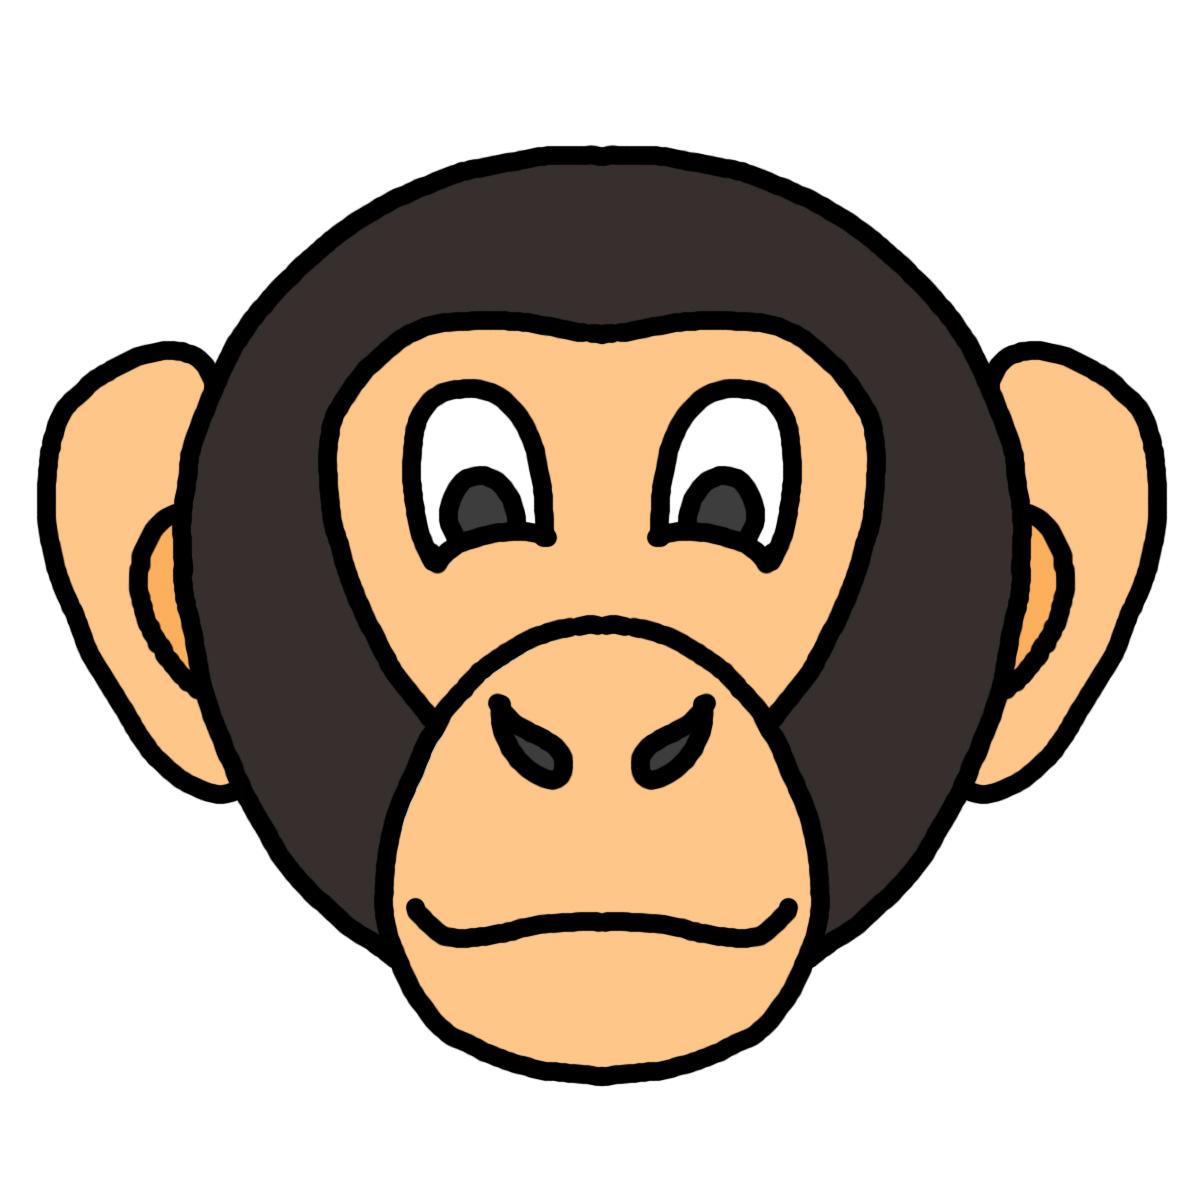 Cartoon Animal Clipart - ClipArt Best